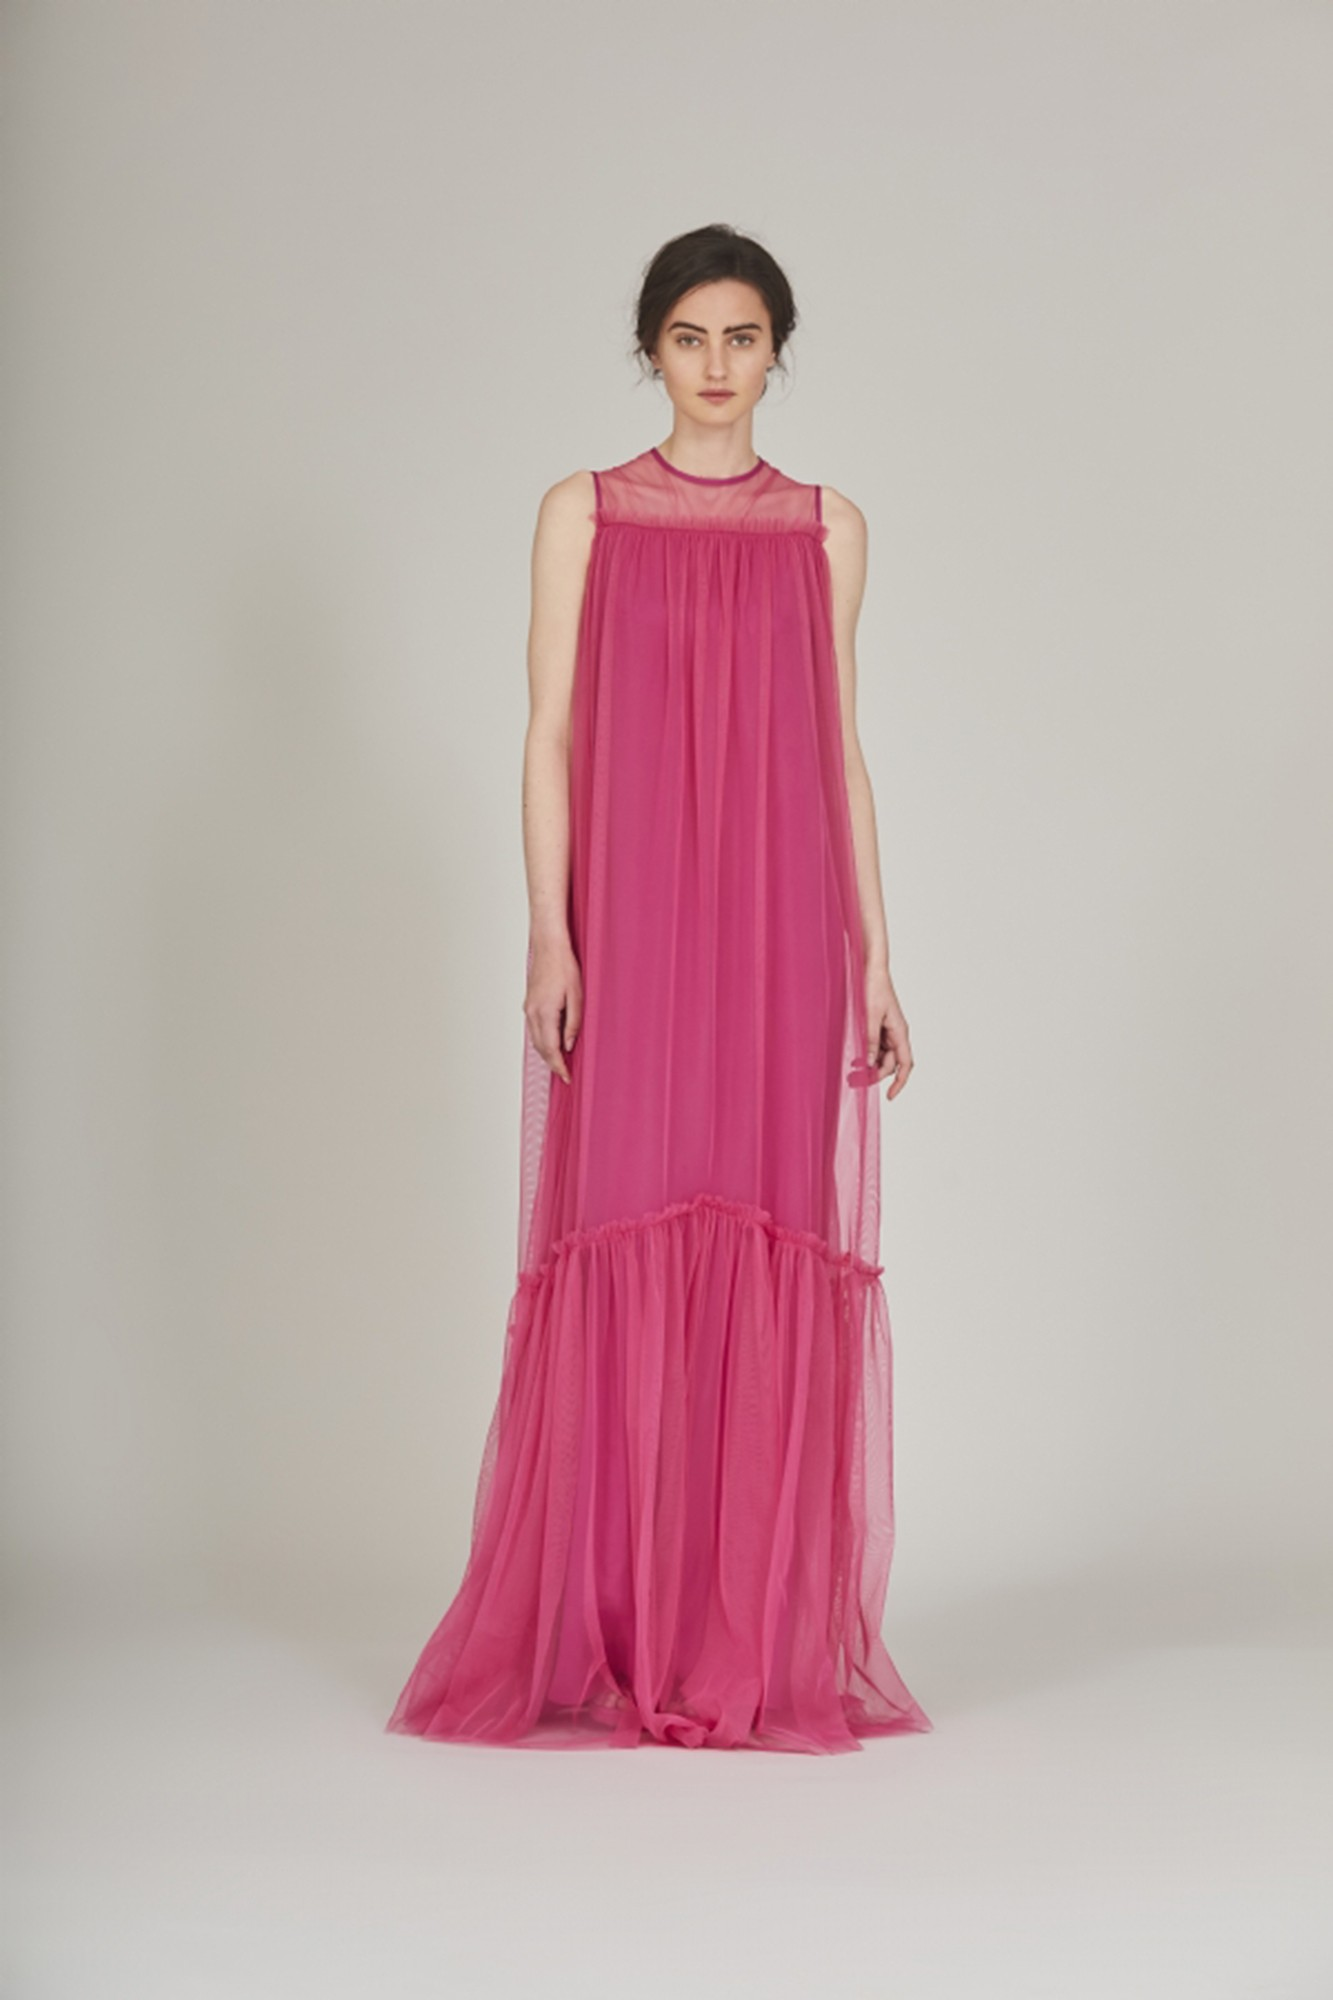 GARBI DRESS